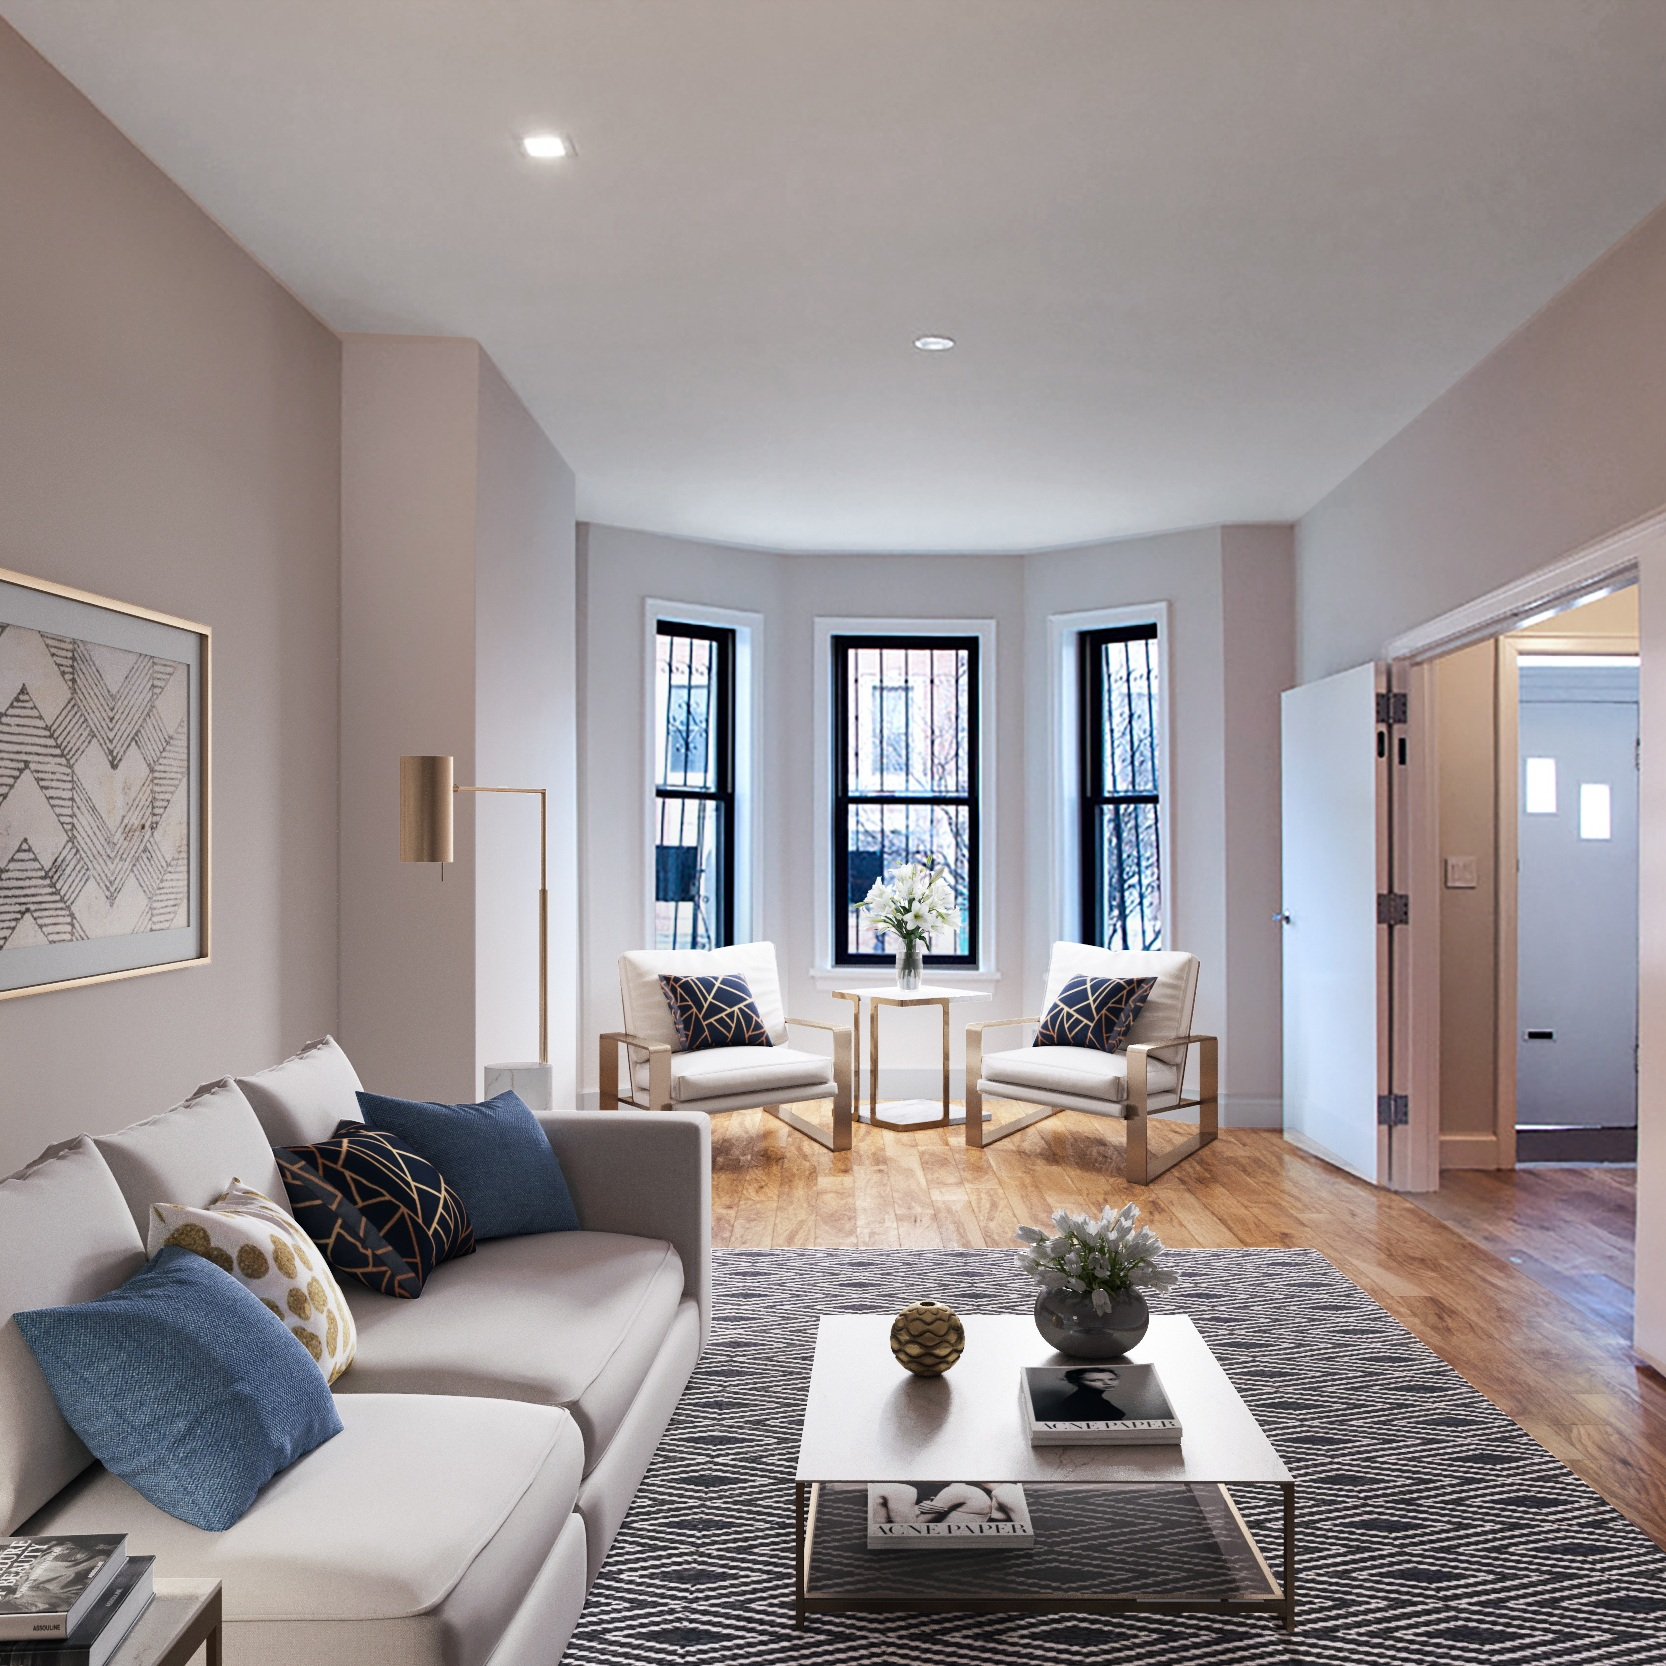 Brooklyn+Parlour+Gut+Renovation+by+Bolster+2.jpg